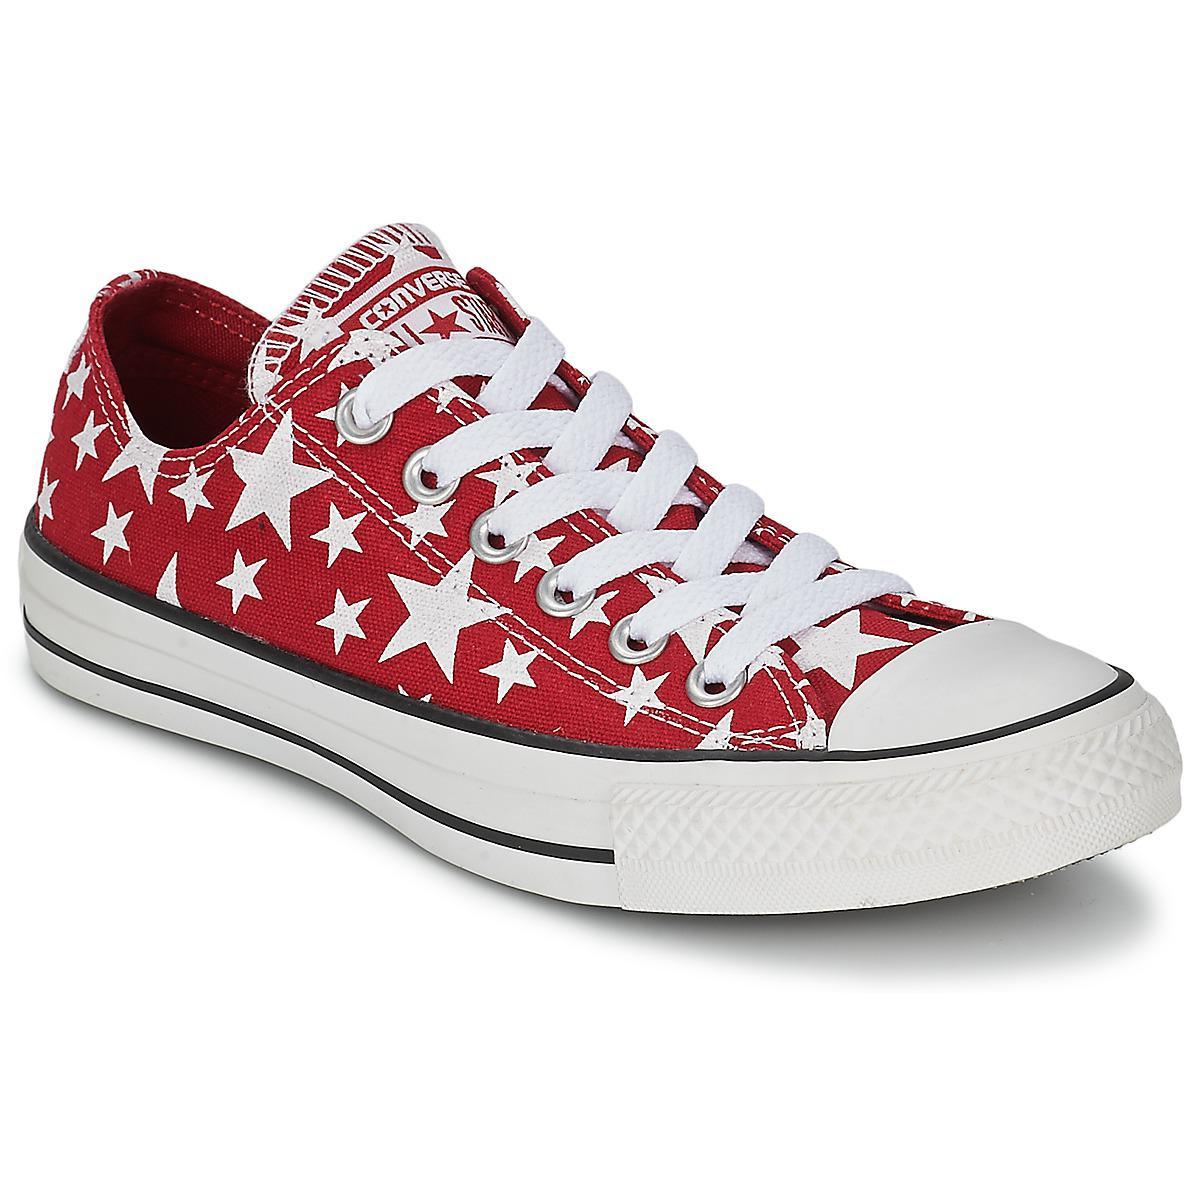 a2deffdd2f Converse Chuck Taylor All Star Multi Star Print Ox Men's Shoes ...